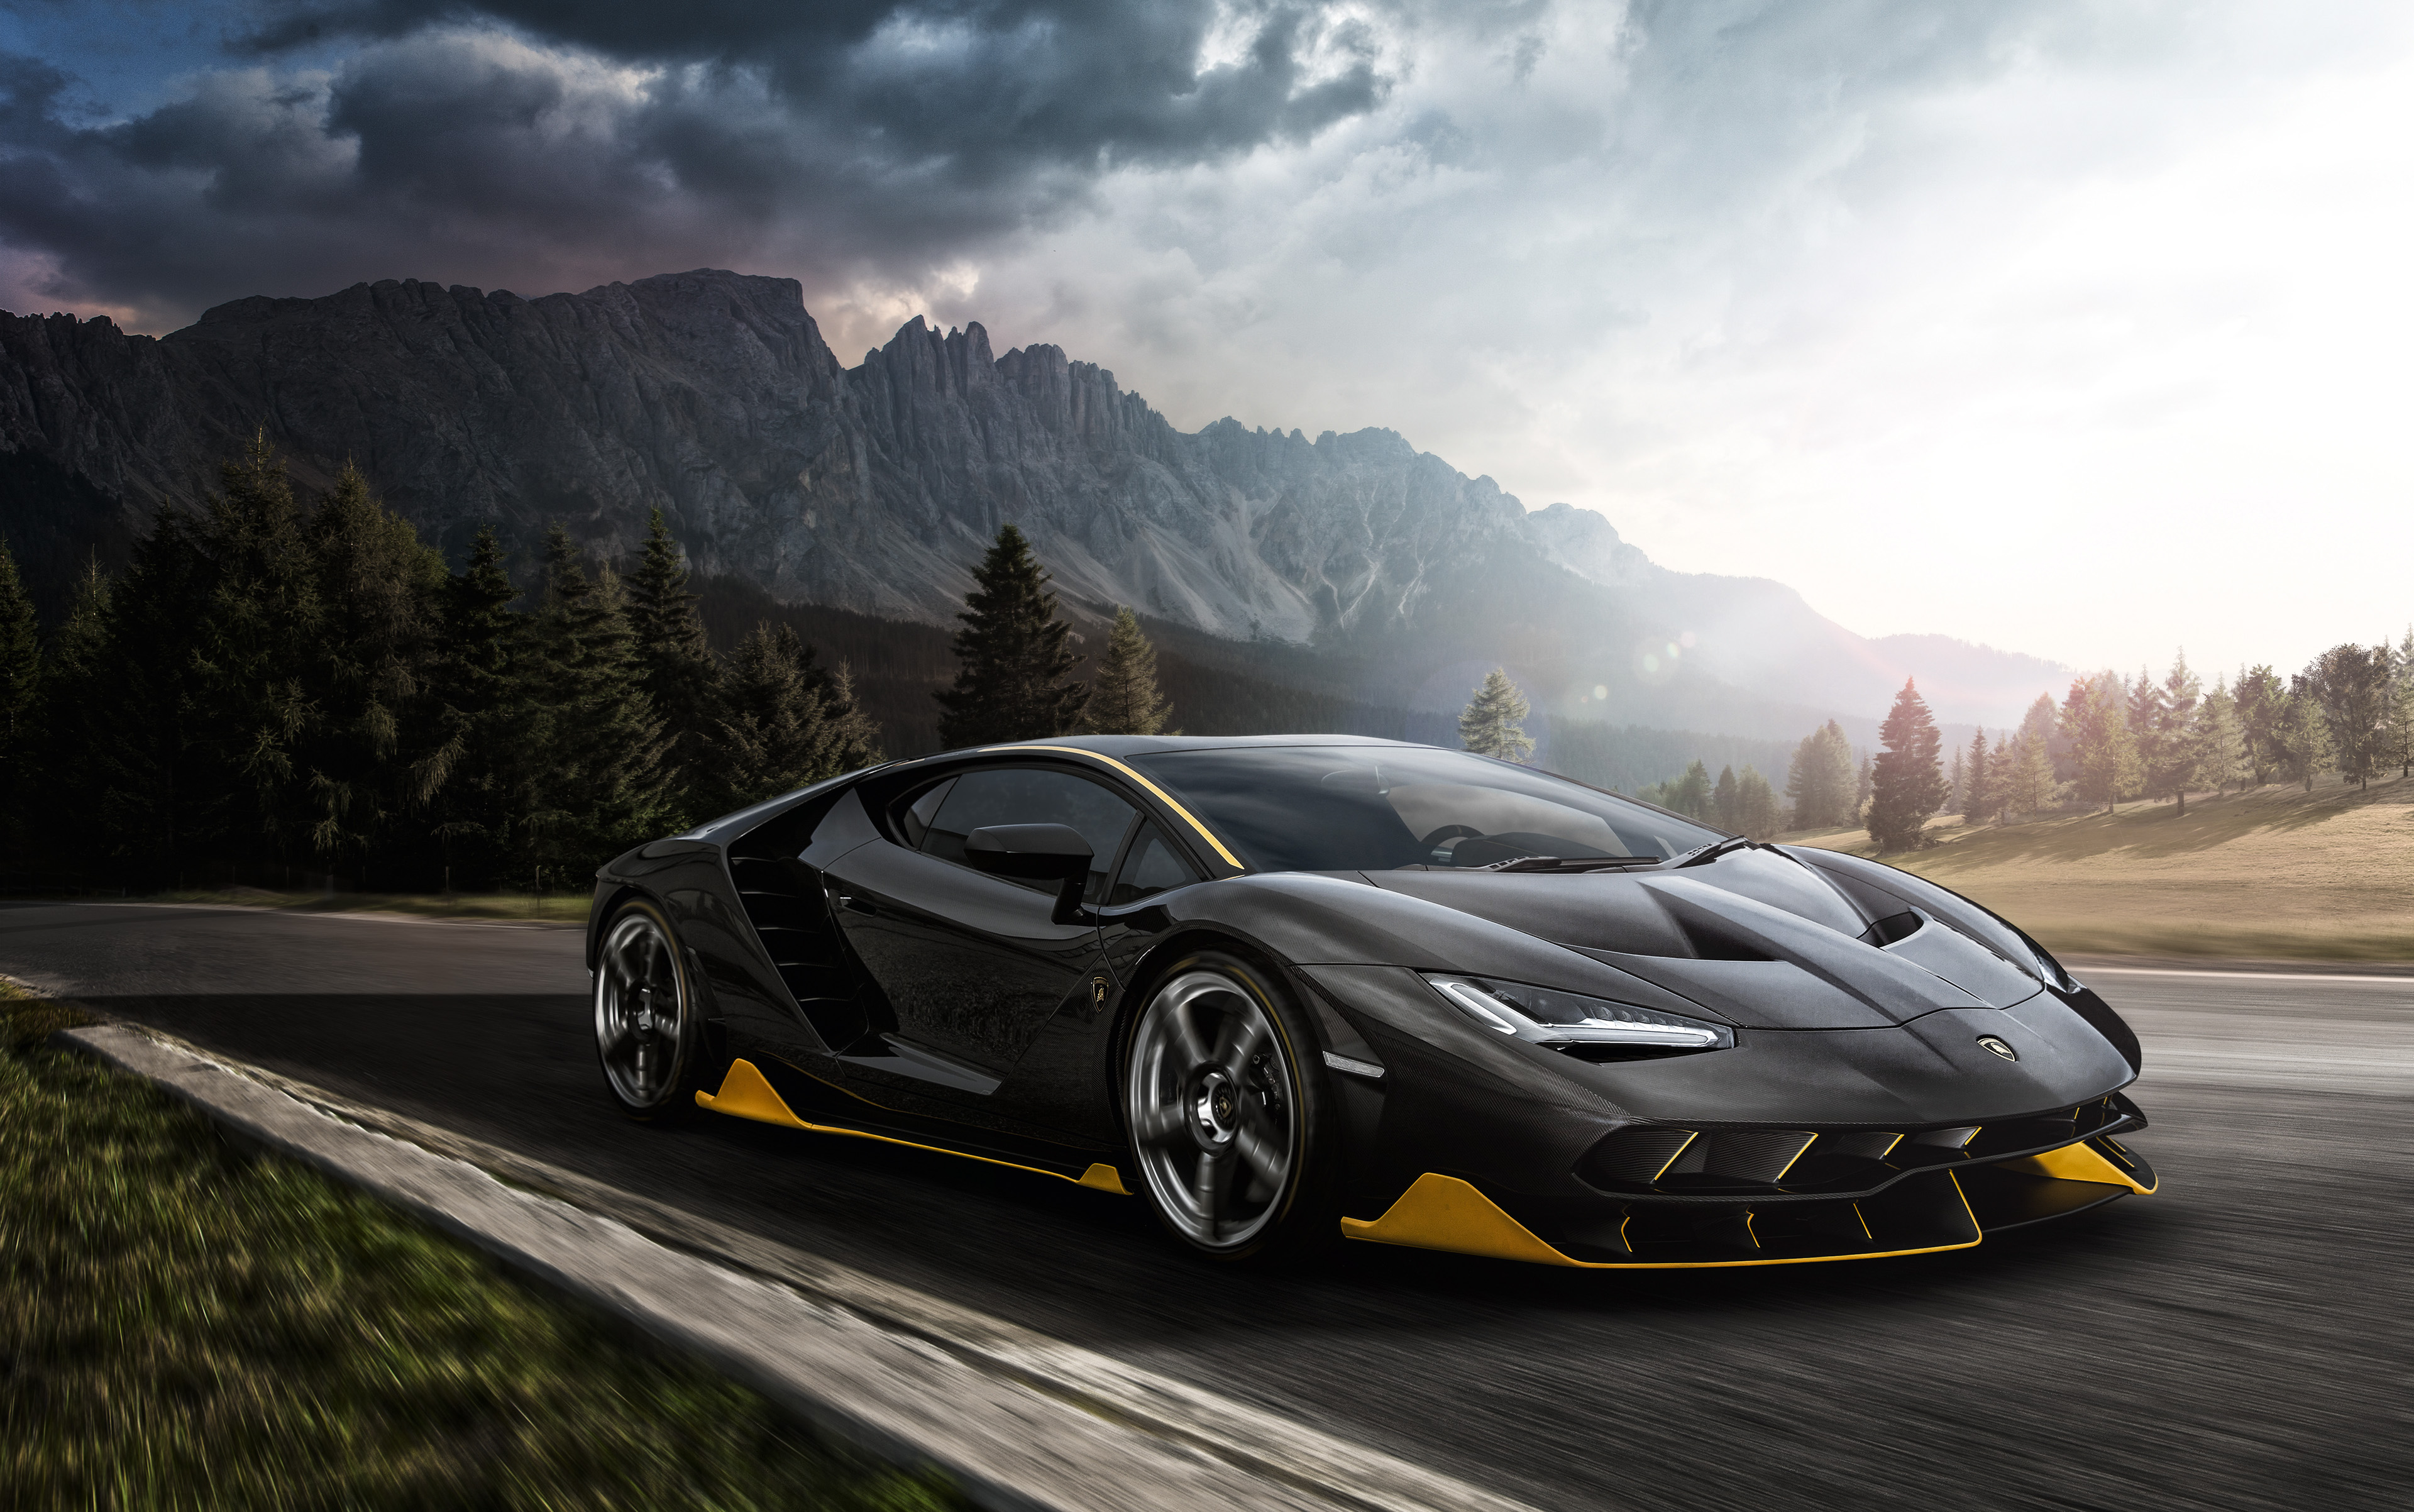 Black Lamborghini Aventador 4k 2018 Hd Cars 4k Wallpapers